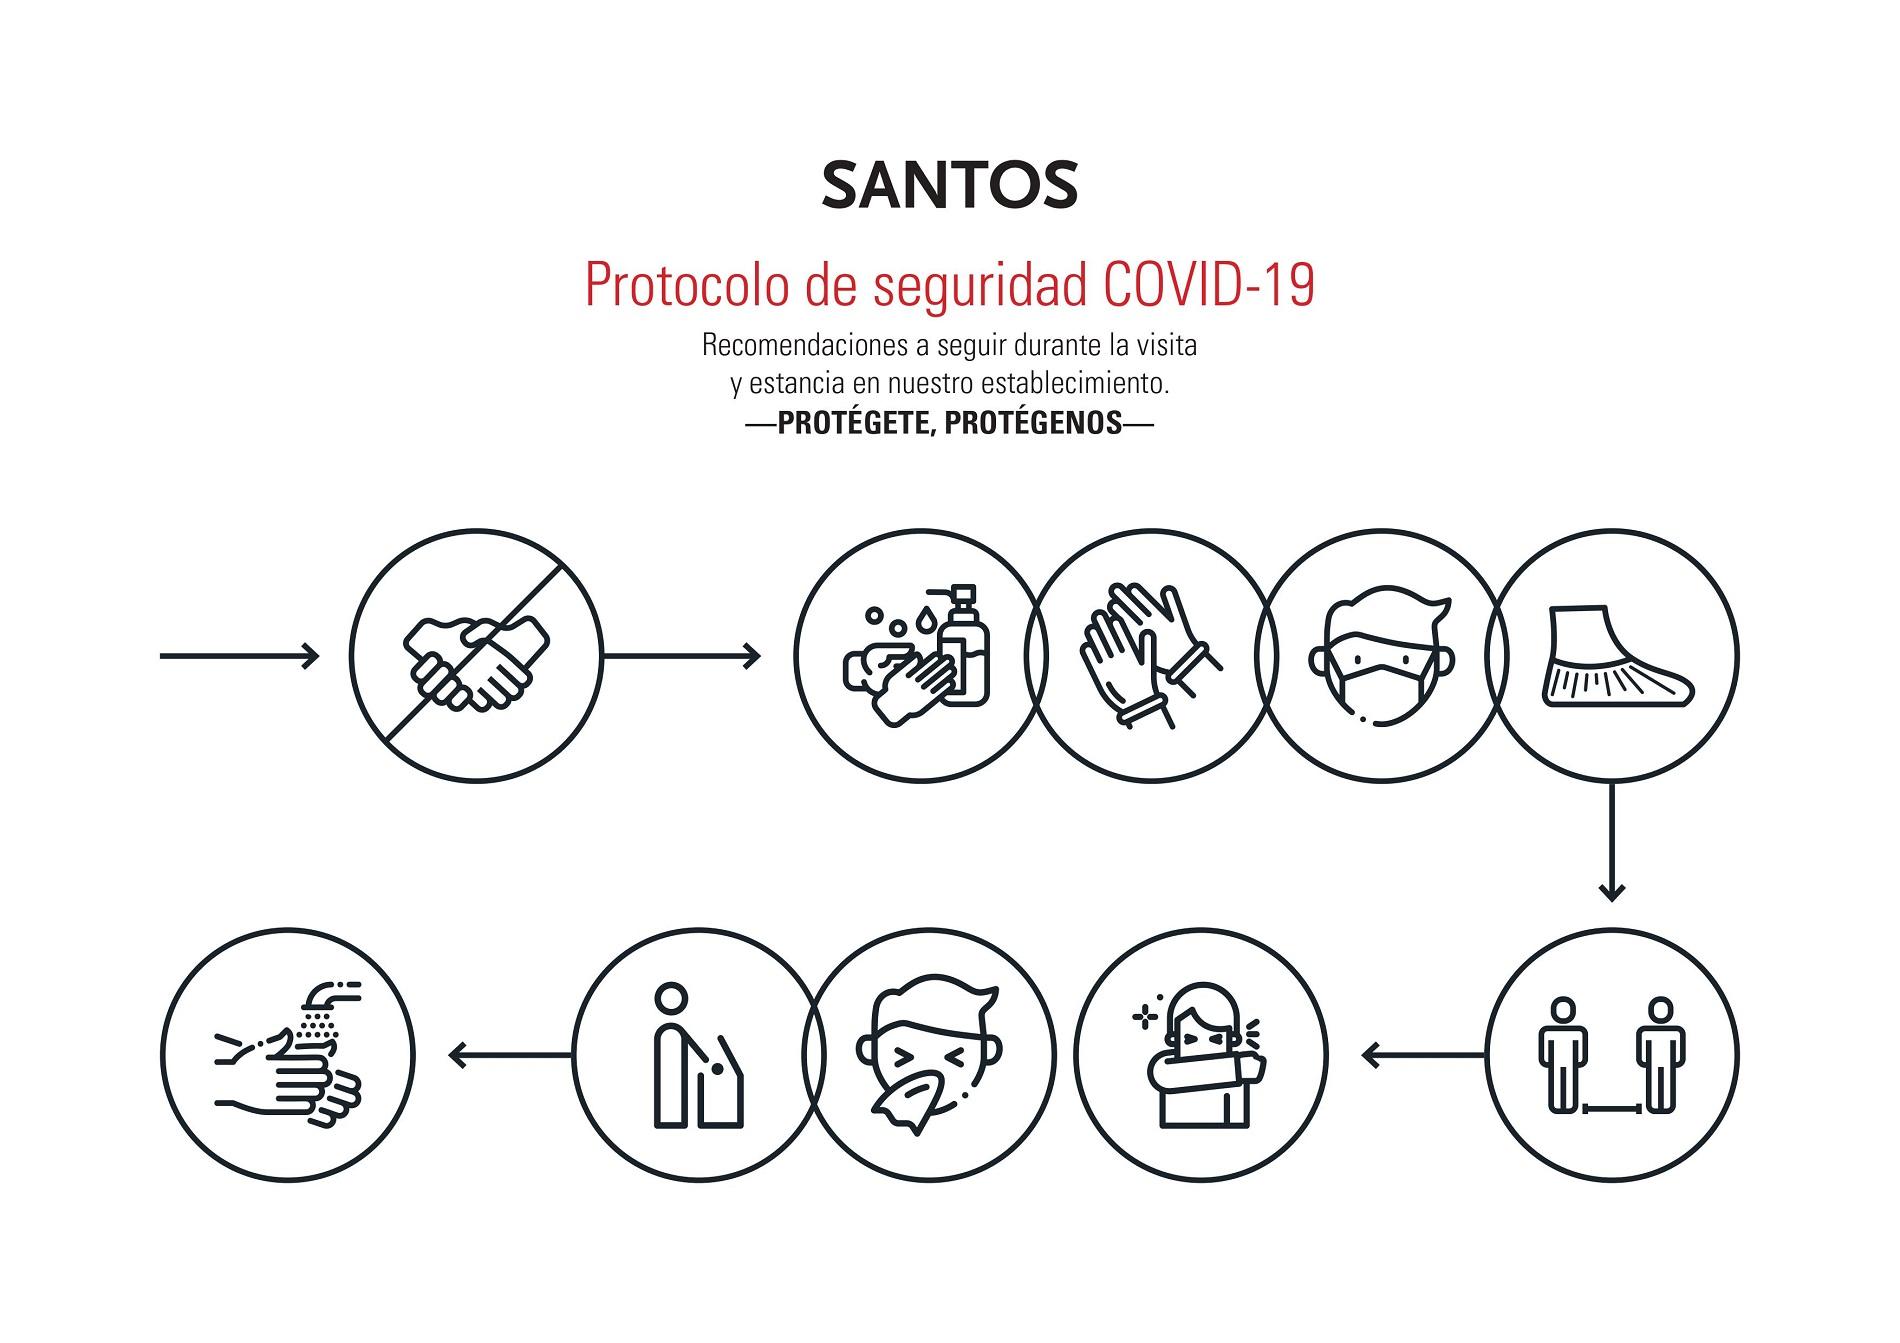 Protocolo de seguridad frente a la COVID-19